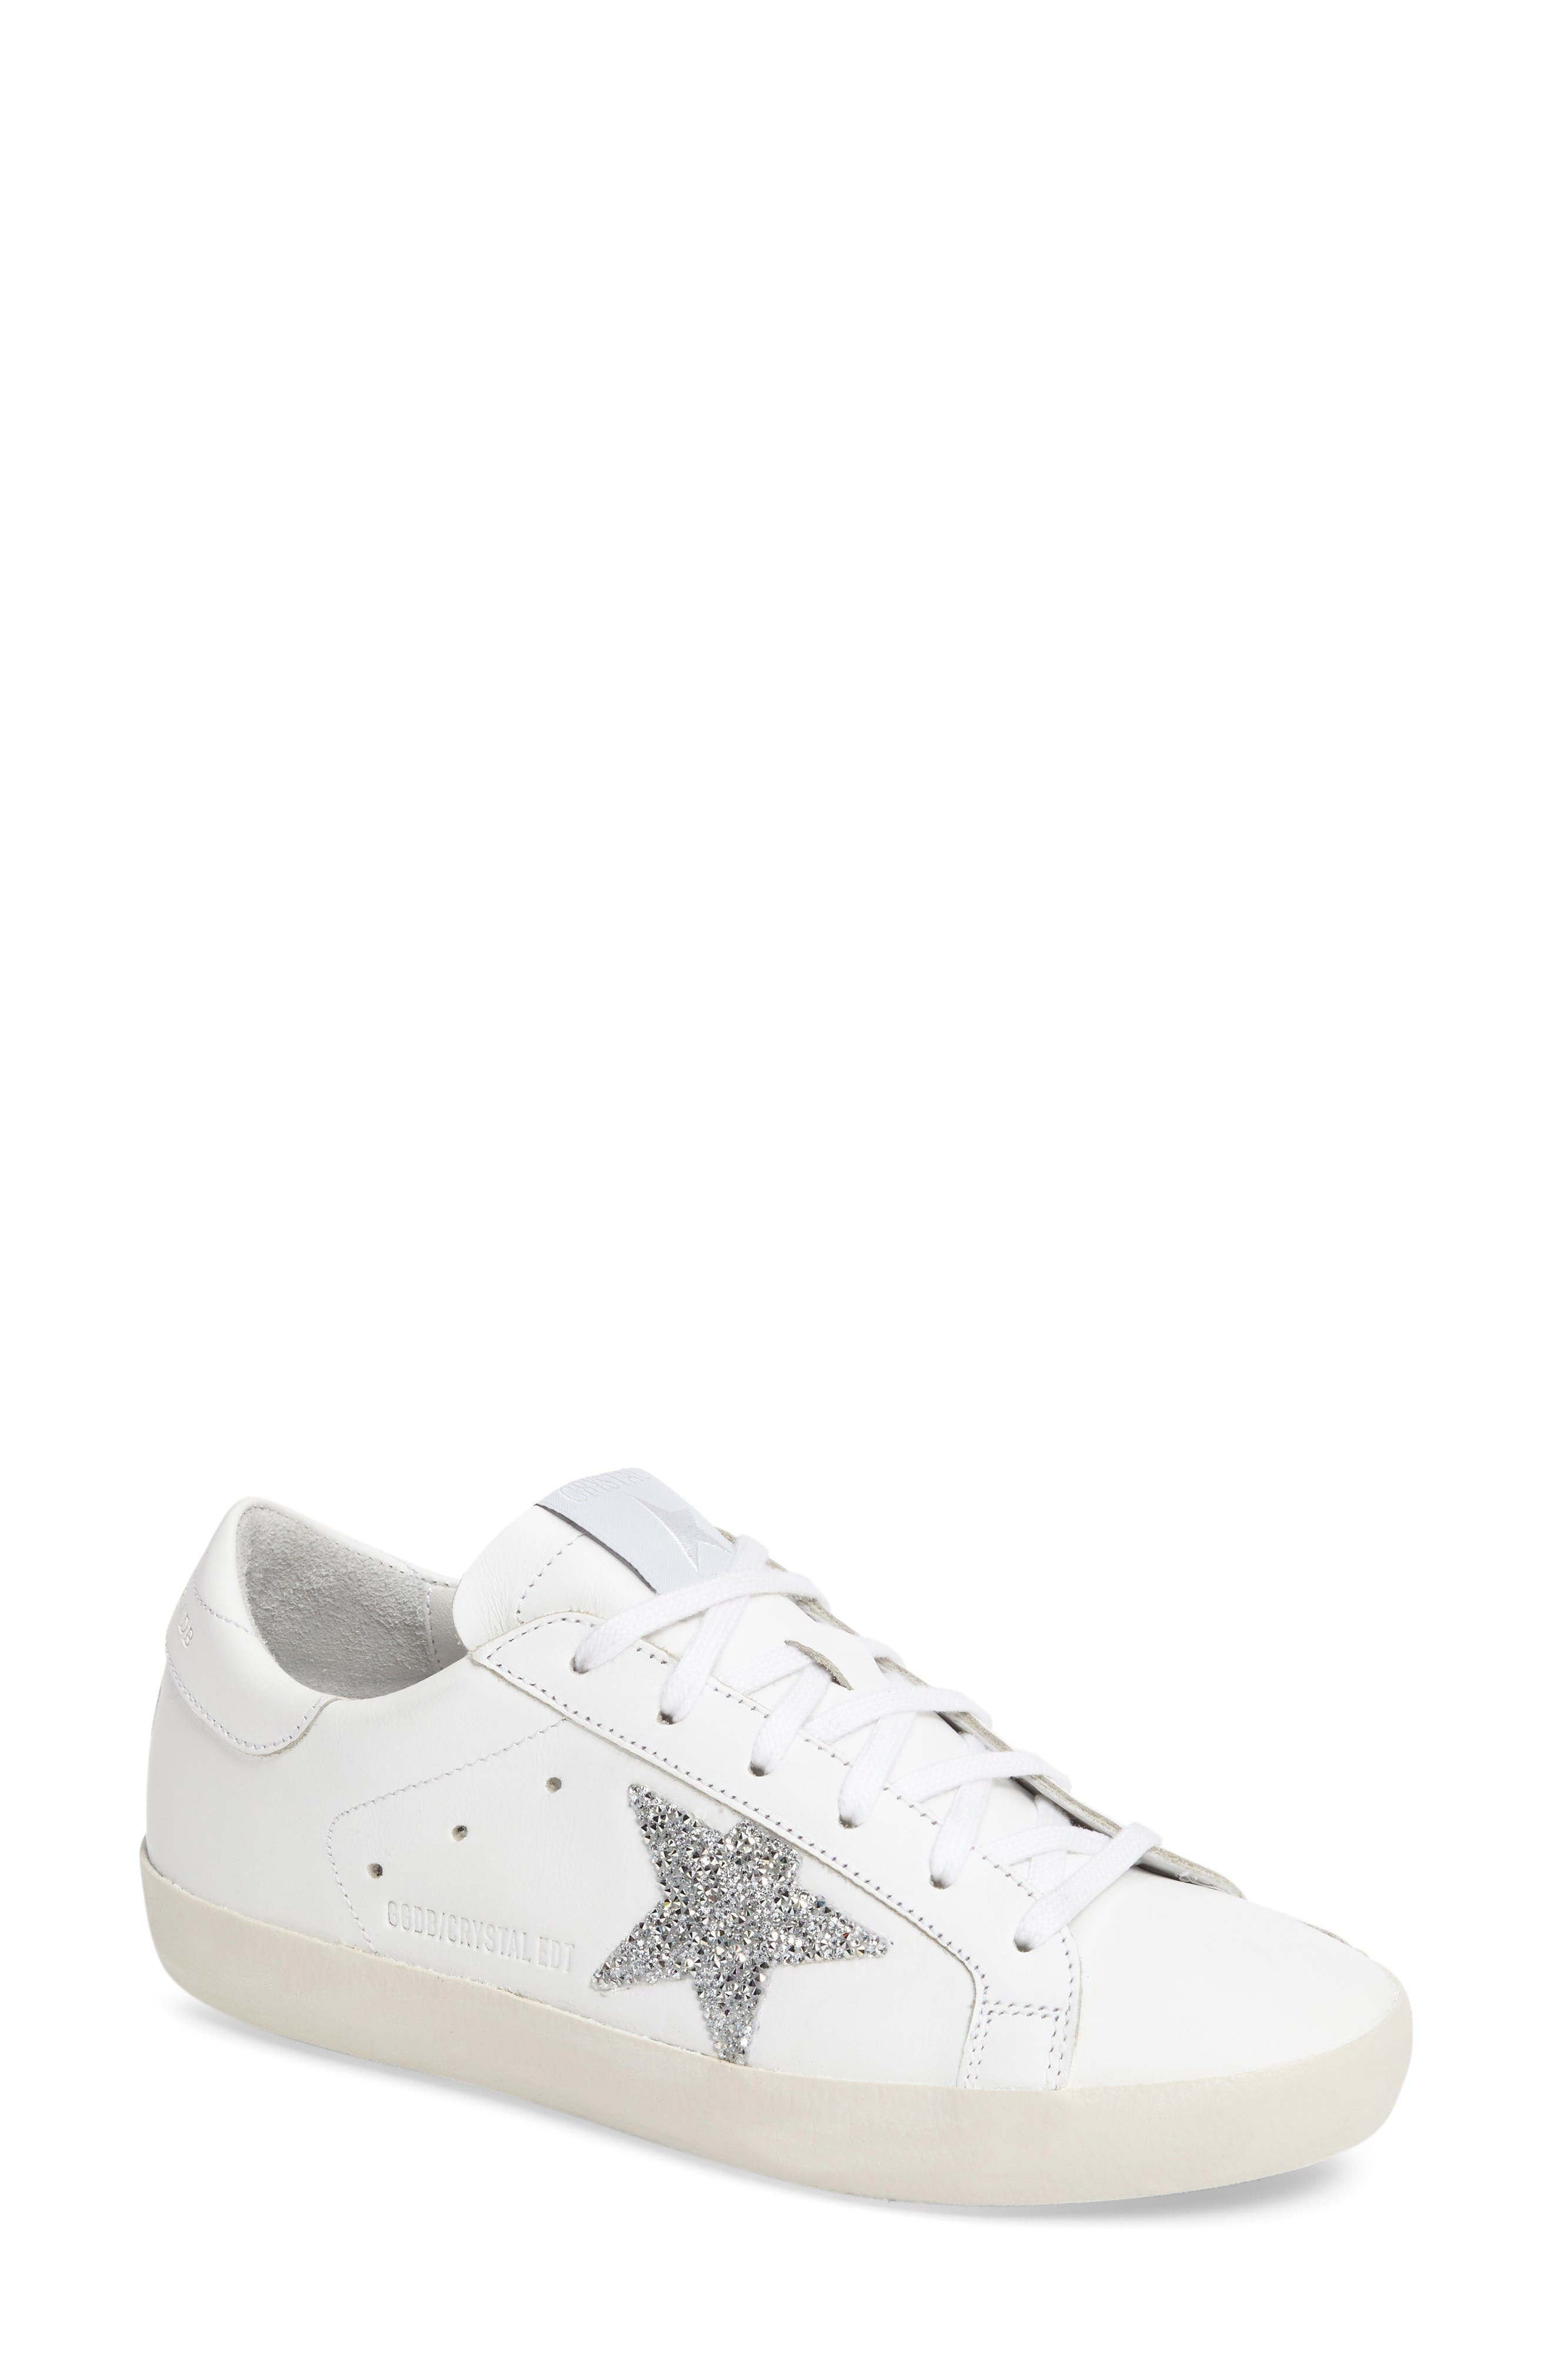 Alternate Image 1 Selected - Golden Goose Superstar High Top Swarovski Crystal Sneaker (Women)